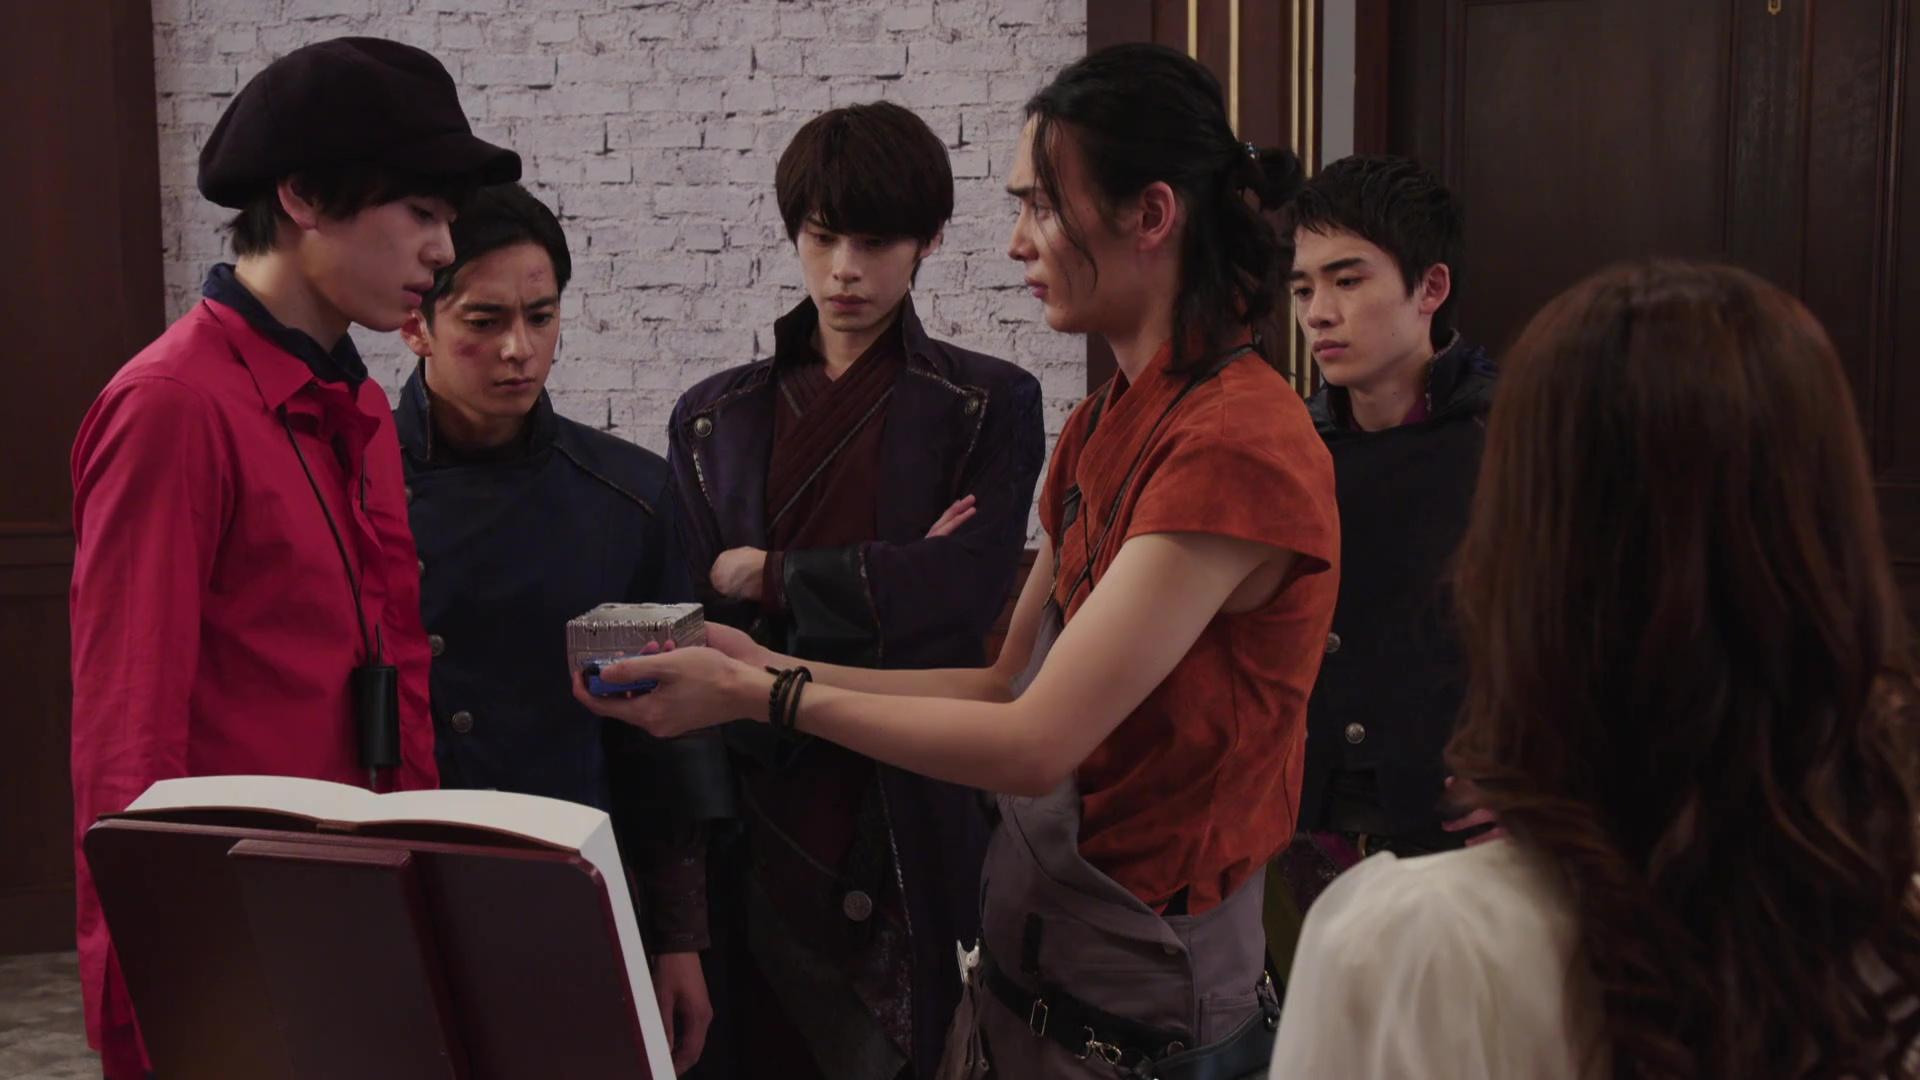 Kamen Rider Saber Episode 8 Recap